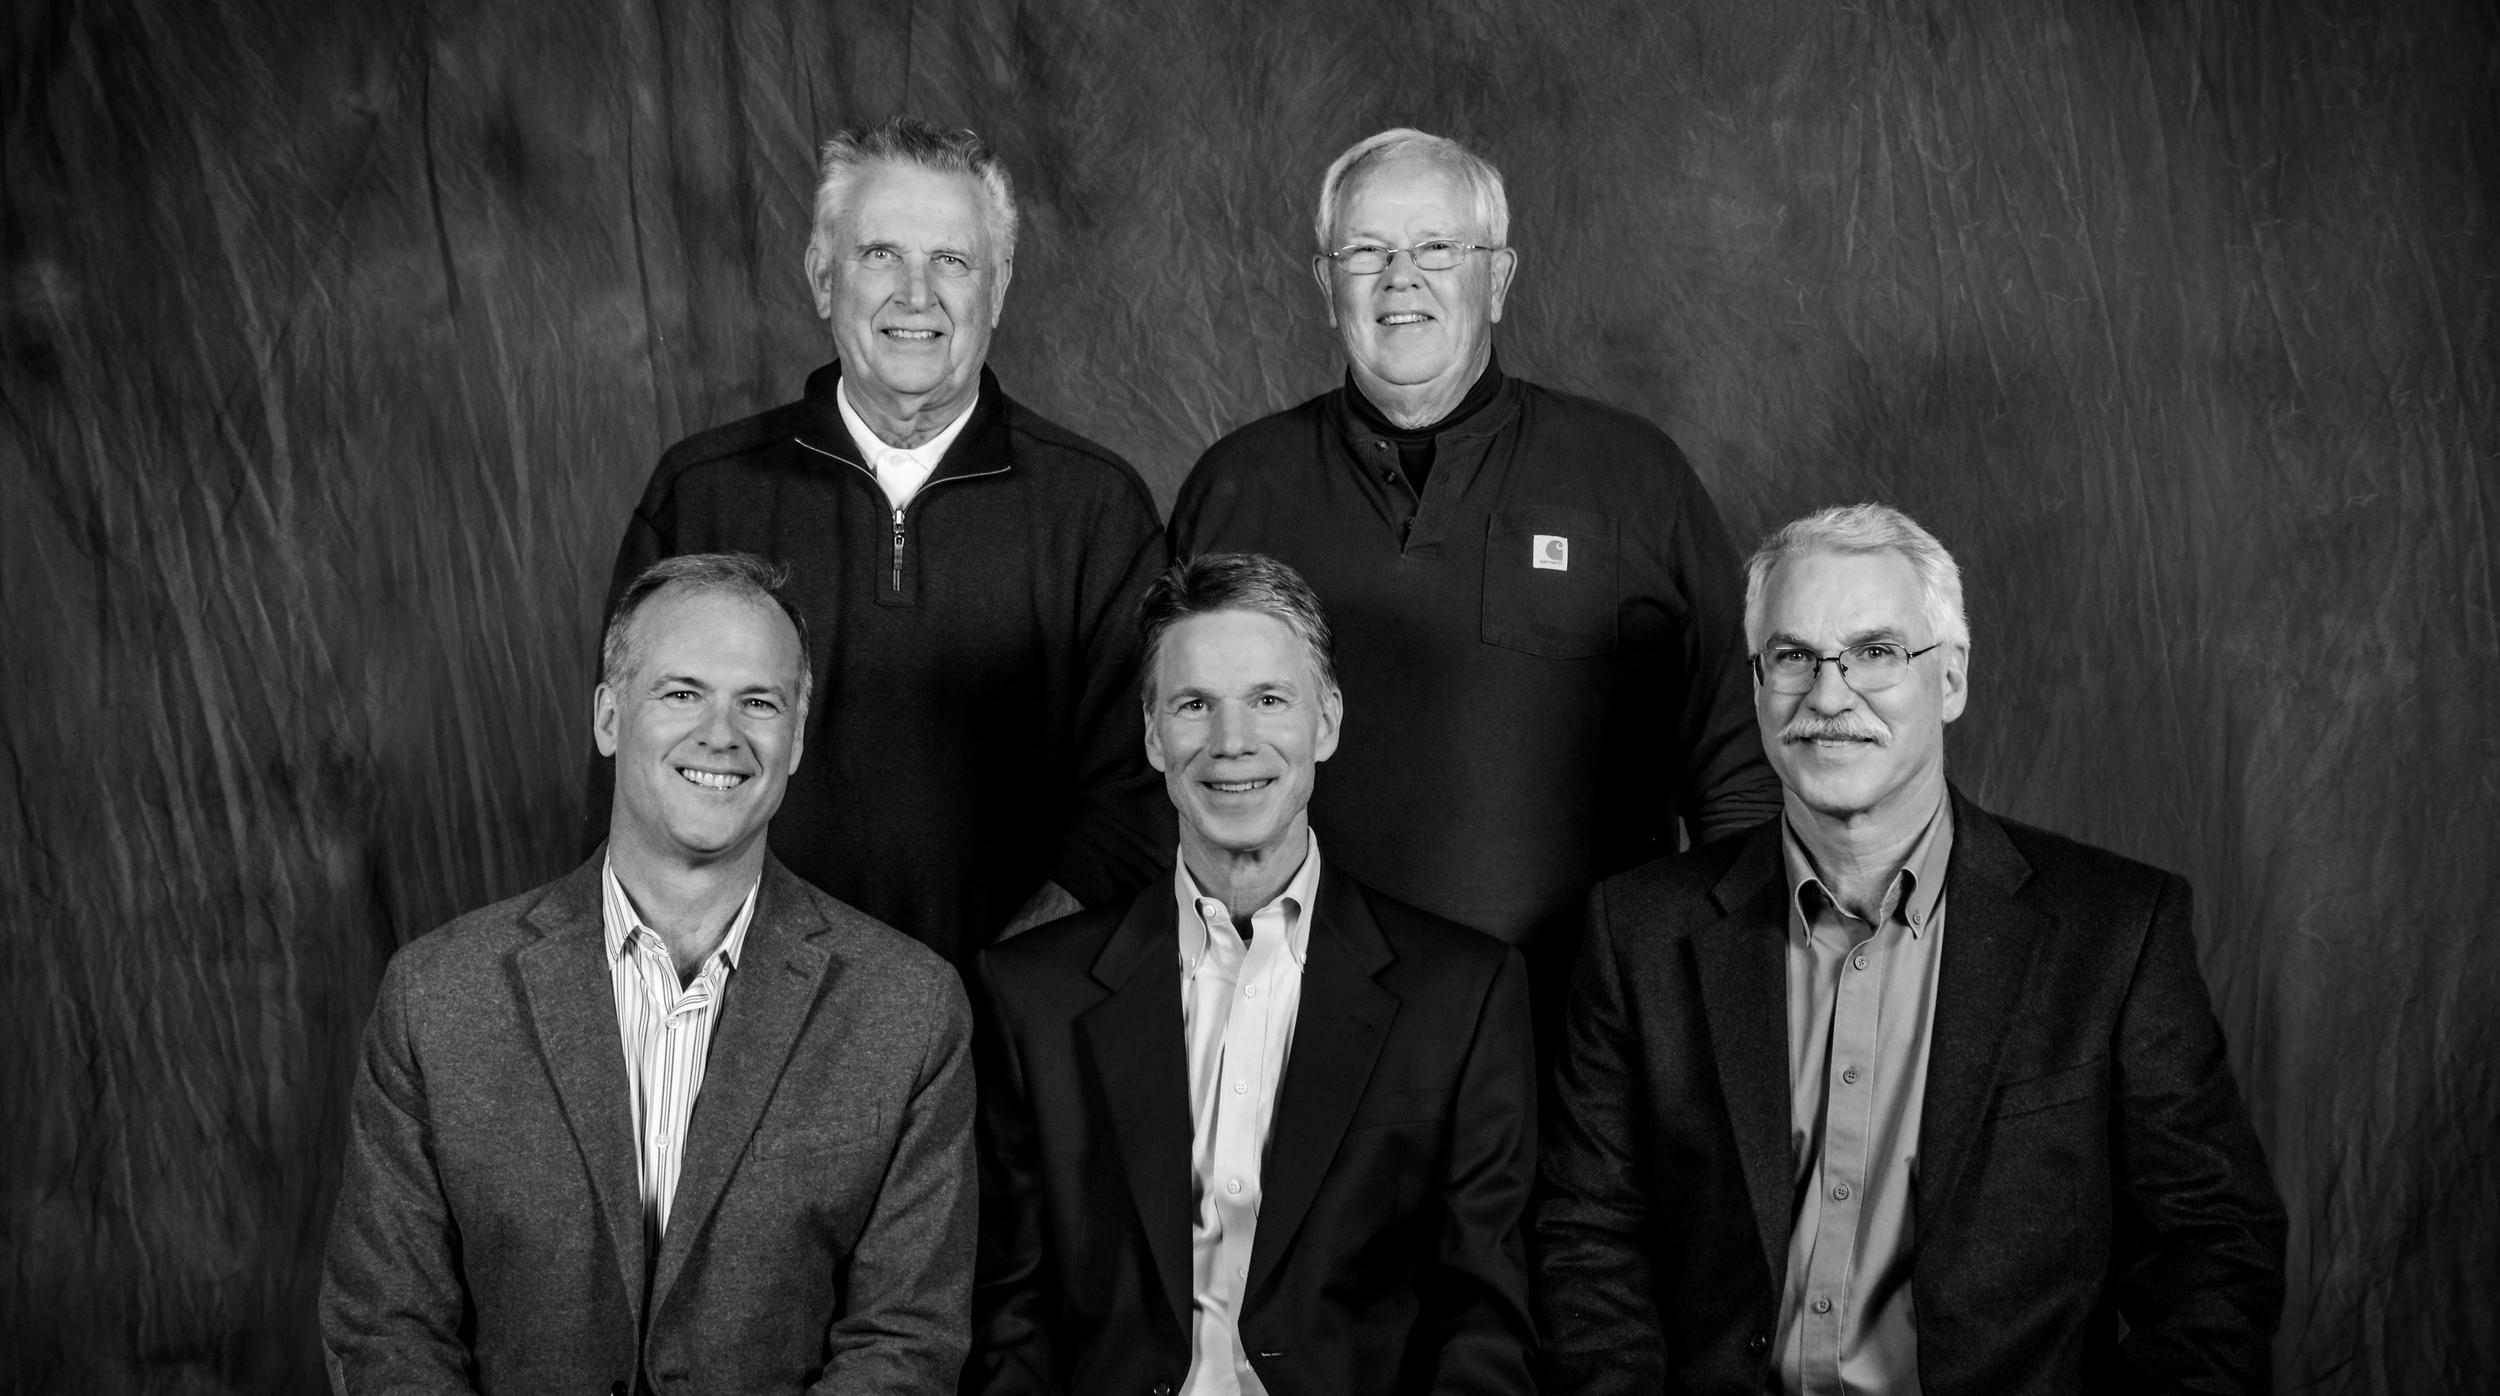 Back Row - Left to Right: Lee Stirrett, Brian Johnsen; Front Row - Left to Right: Steve Stirrett, Sean Sullivan, Steve Sullivan